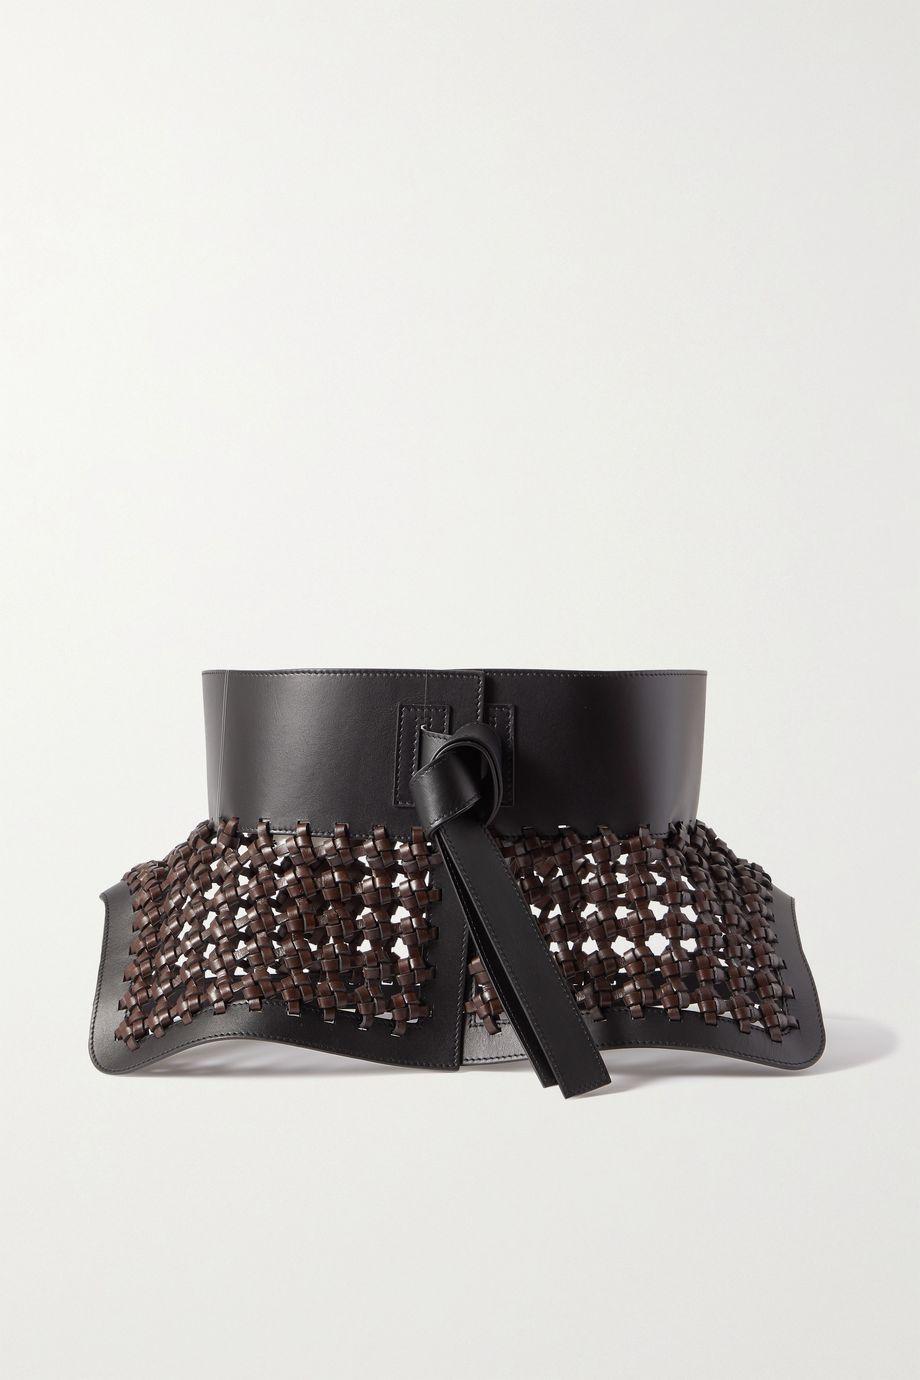 Loewe Obi woven leather belt